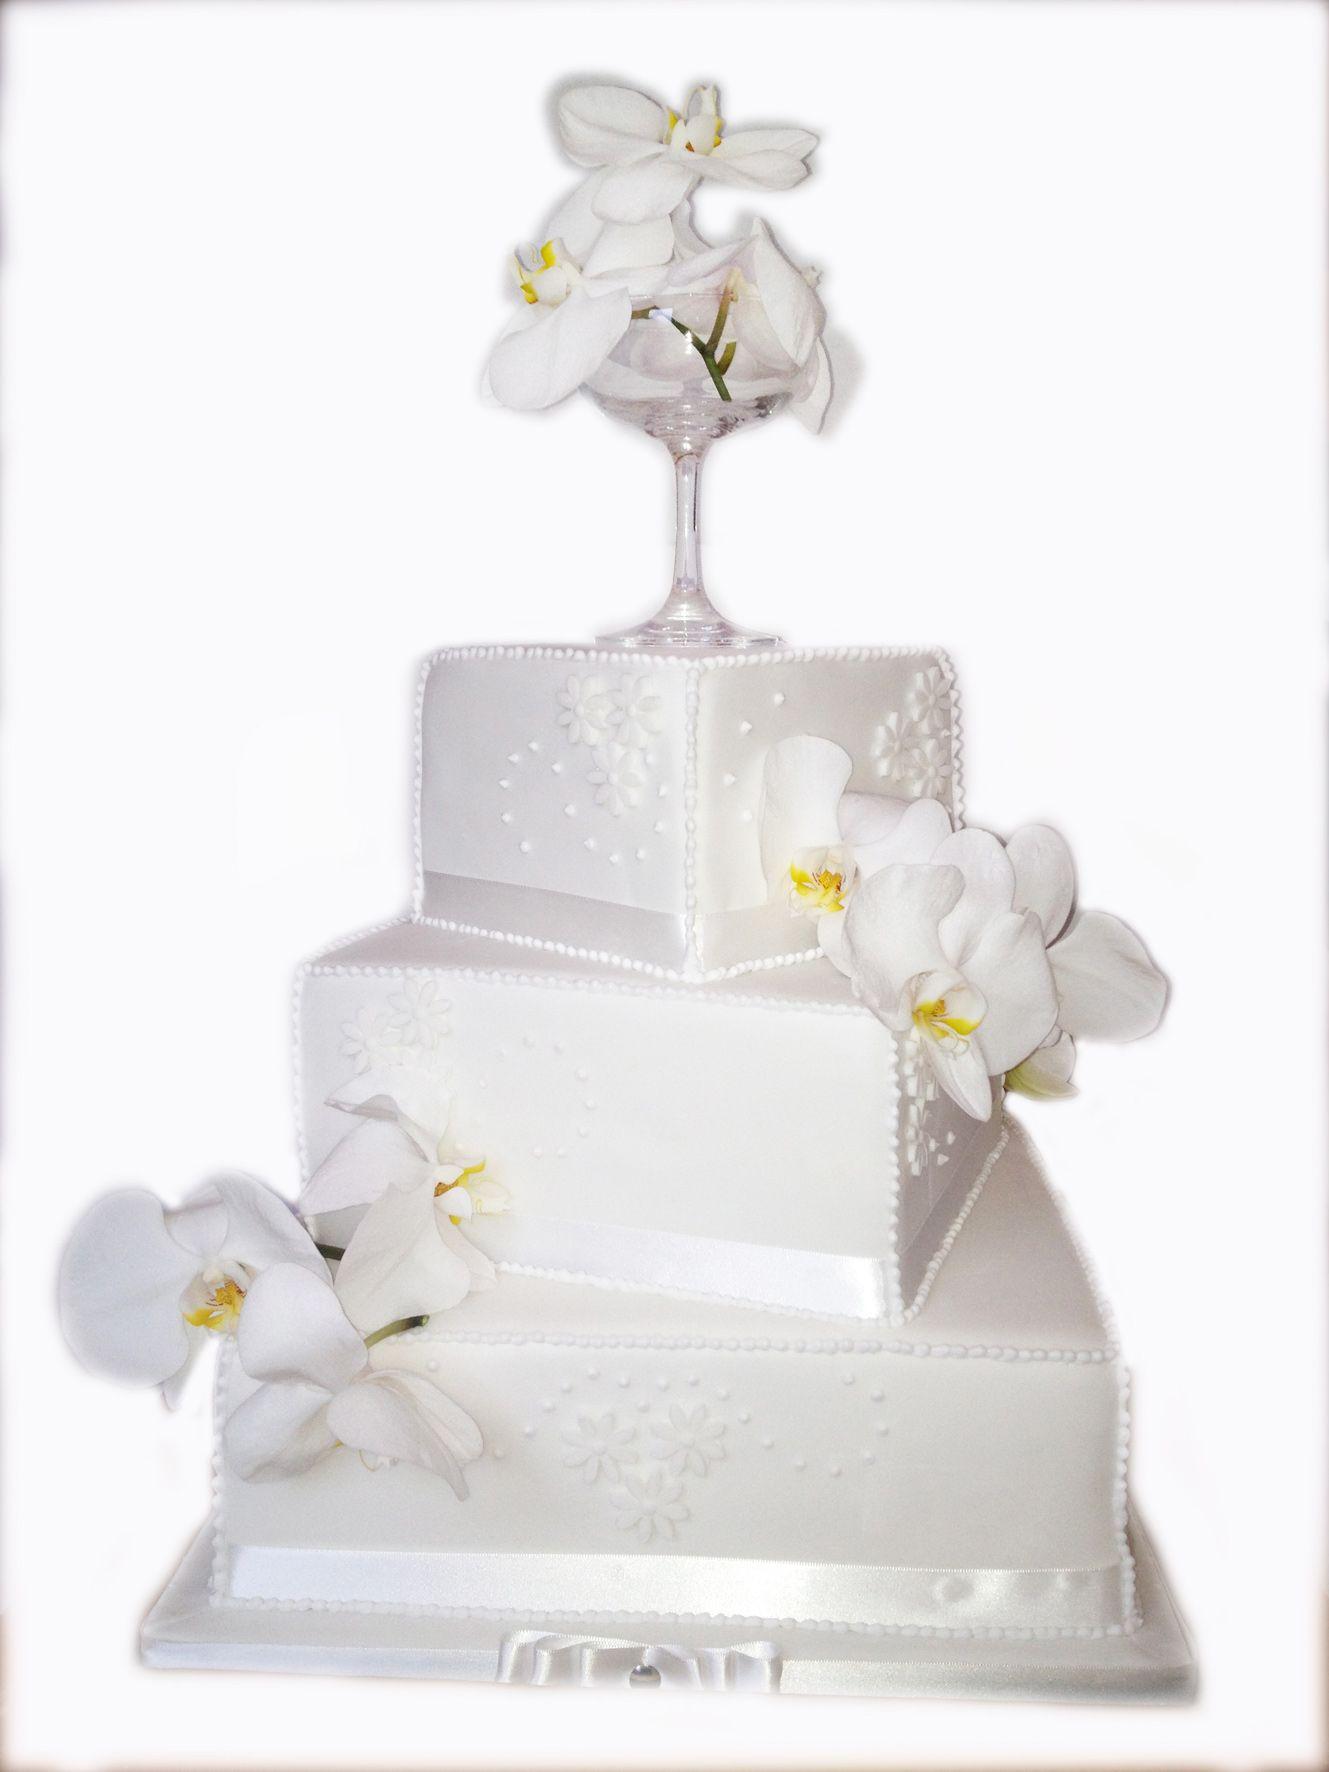 3 Tier Wedding Cake - White Orchids | Sweet Cheeks Cake Design ...